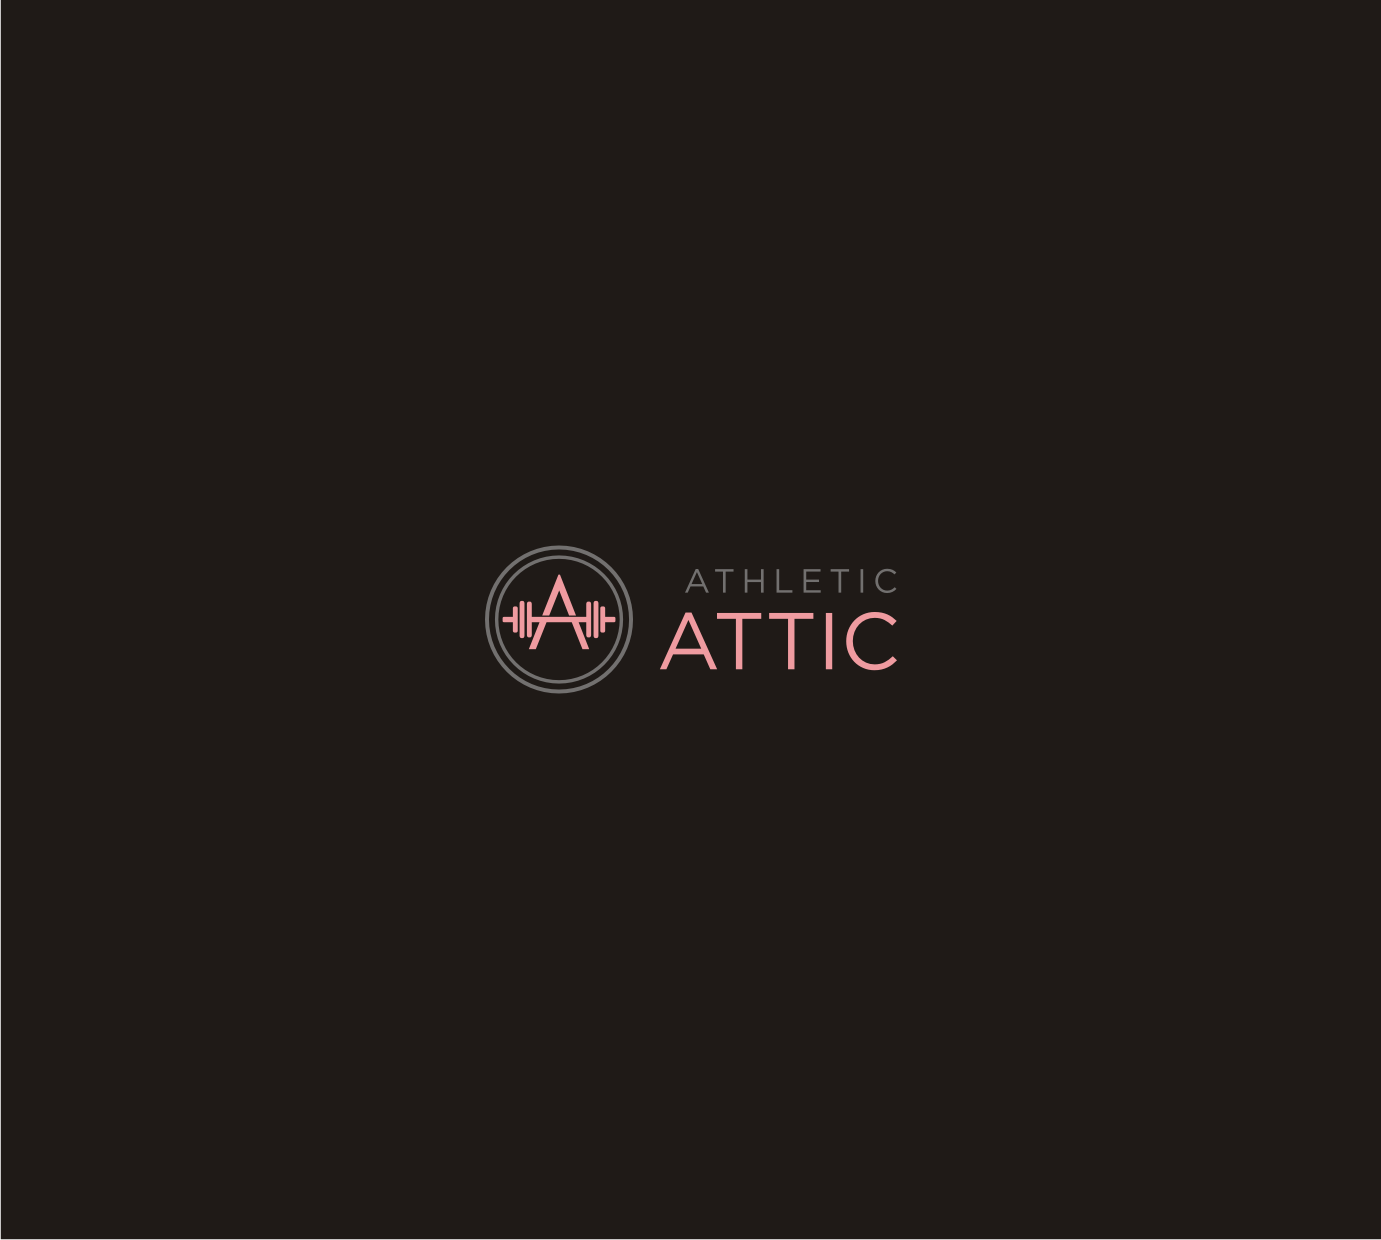 Logo Design by Sigitumarali Sigit - Entry No. 130 in the Logo Design Contest Fun Logo Design for Athletic Attic.